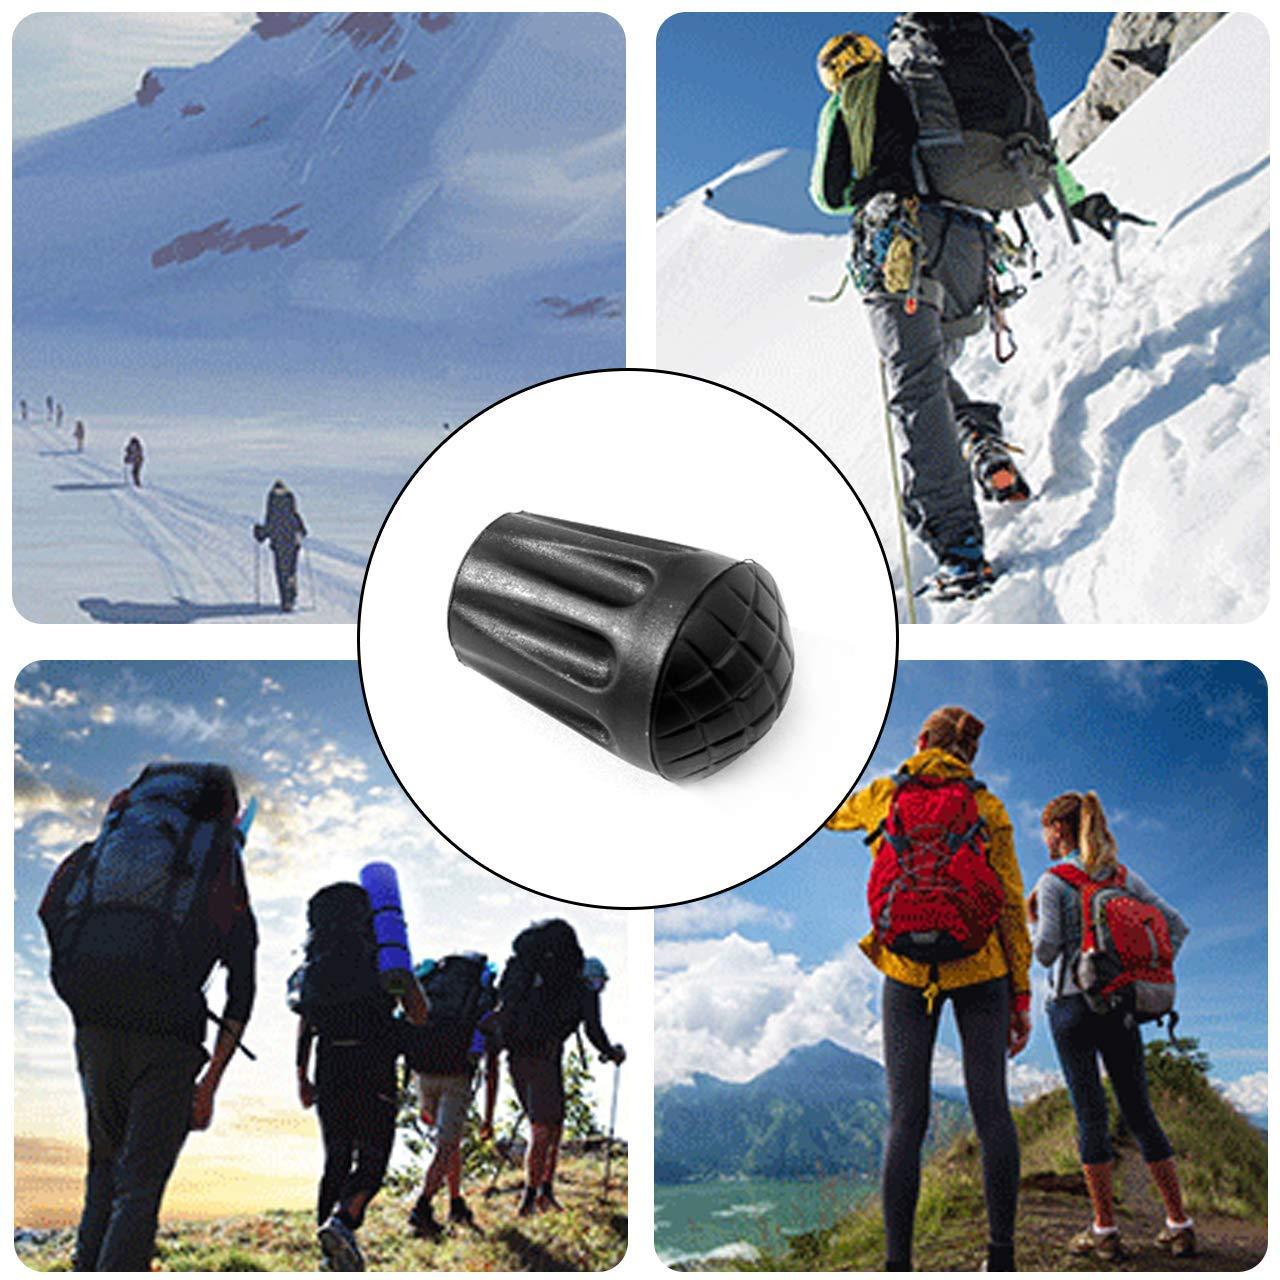 Trekking Universal Tapa Cubierta Protectores Puntas de Goma para Bastones de Trekking Jzhen 12PCS Puntas de Goma para Bastones